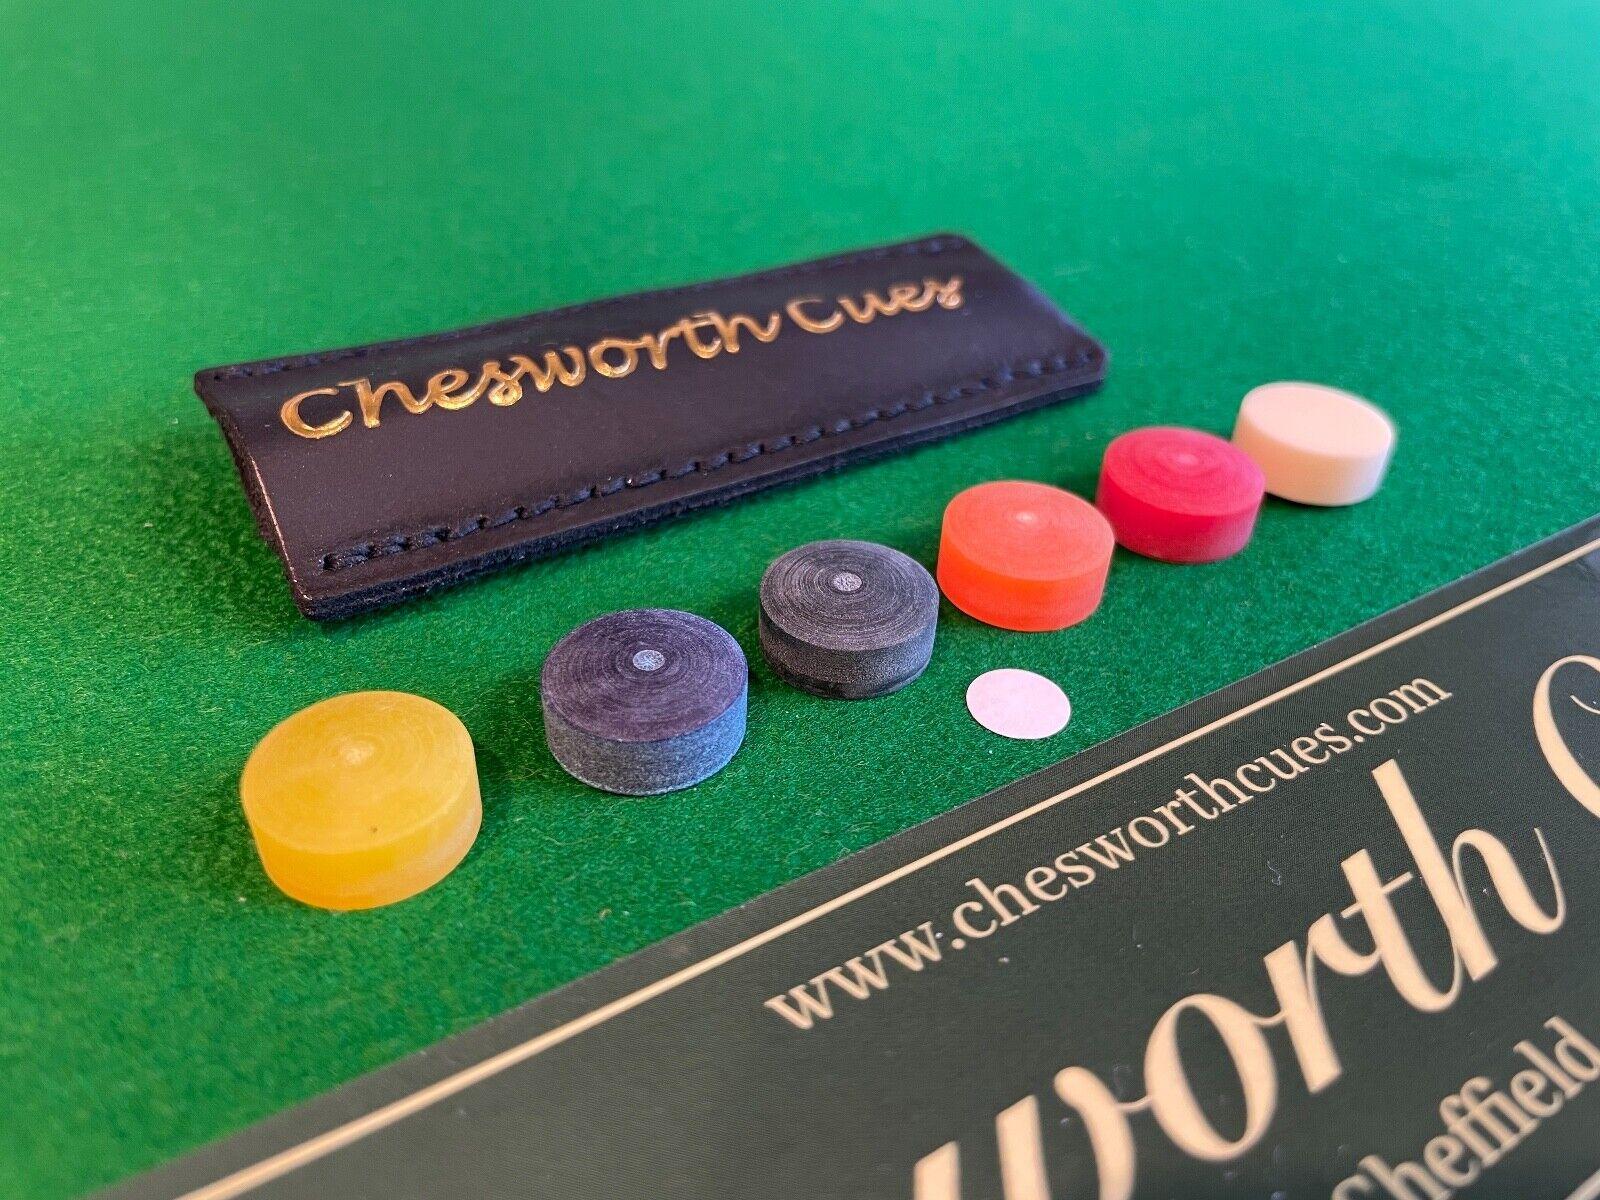 Taom Break and Jump Tip 14mm Snooker/Pool/Billiard Tips, Chesworth Cues, Sheffield